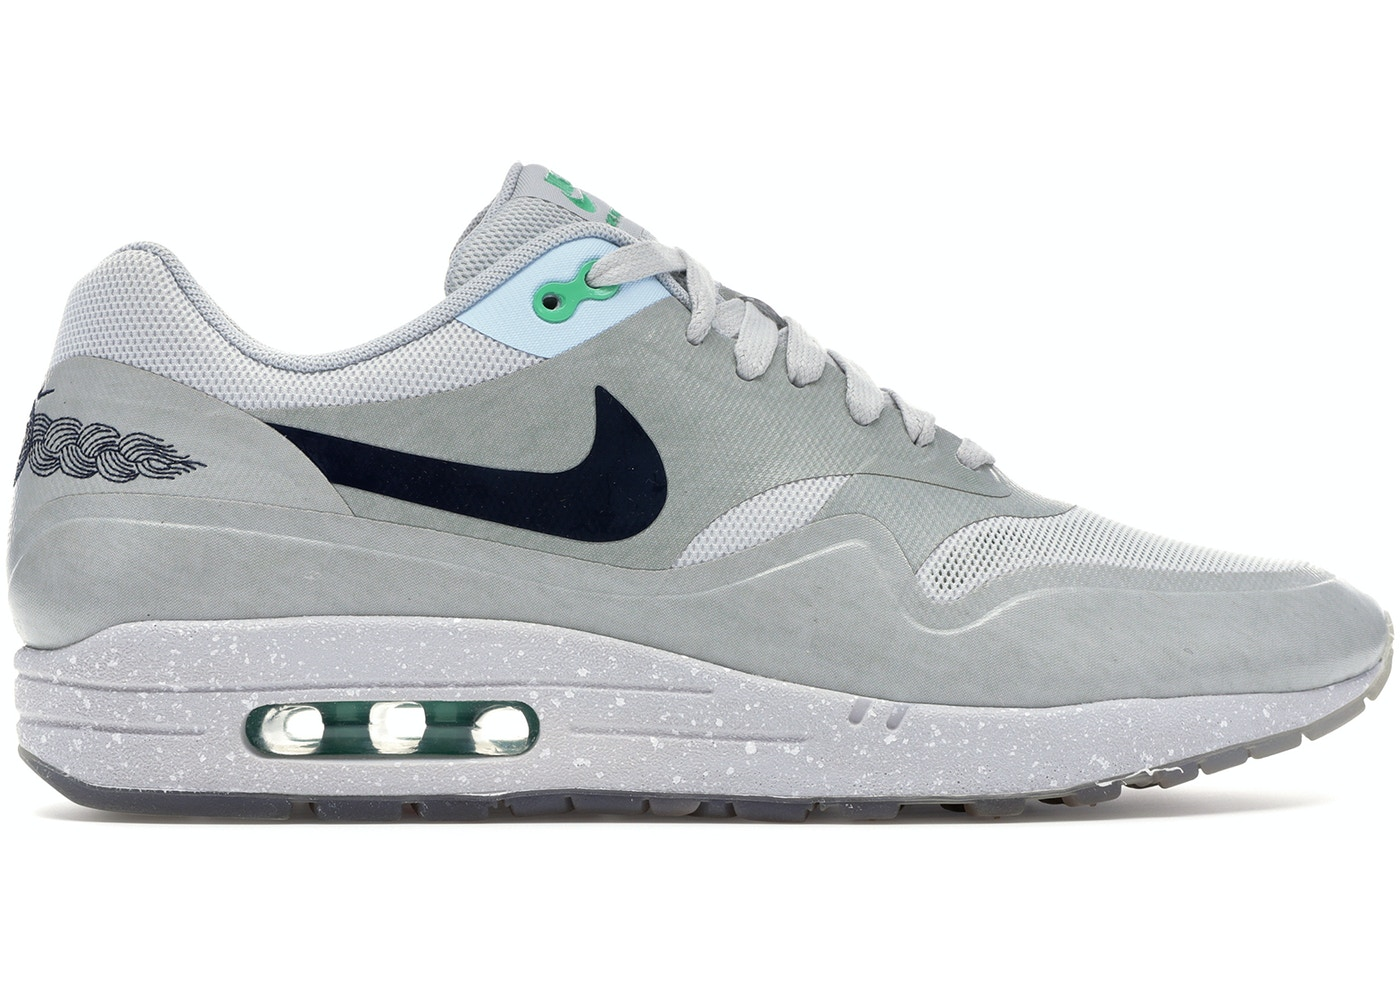 meet 3de94 1f546 Nike Air Max Shoes - Price Premium